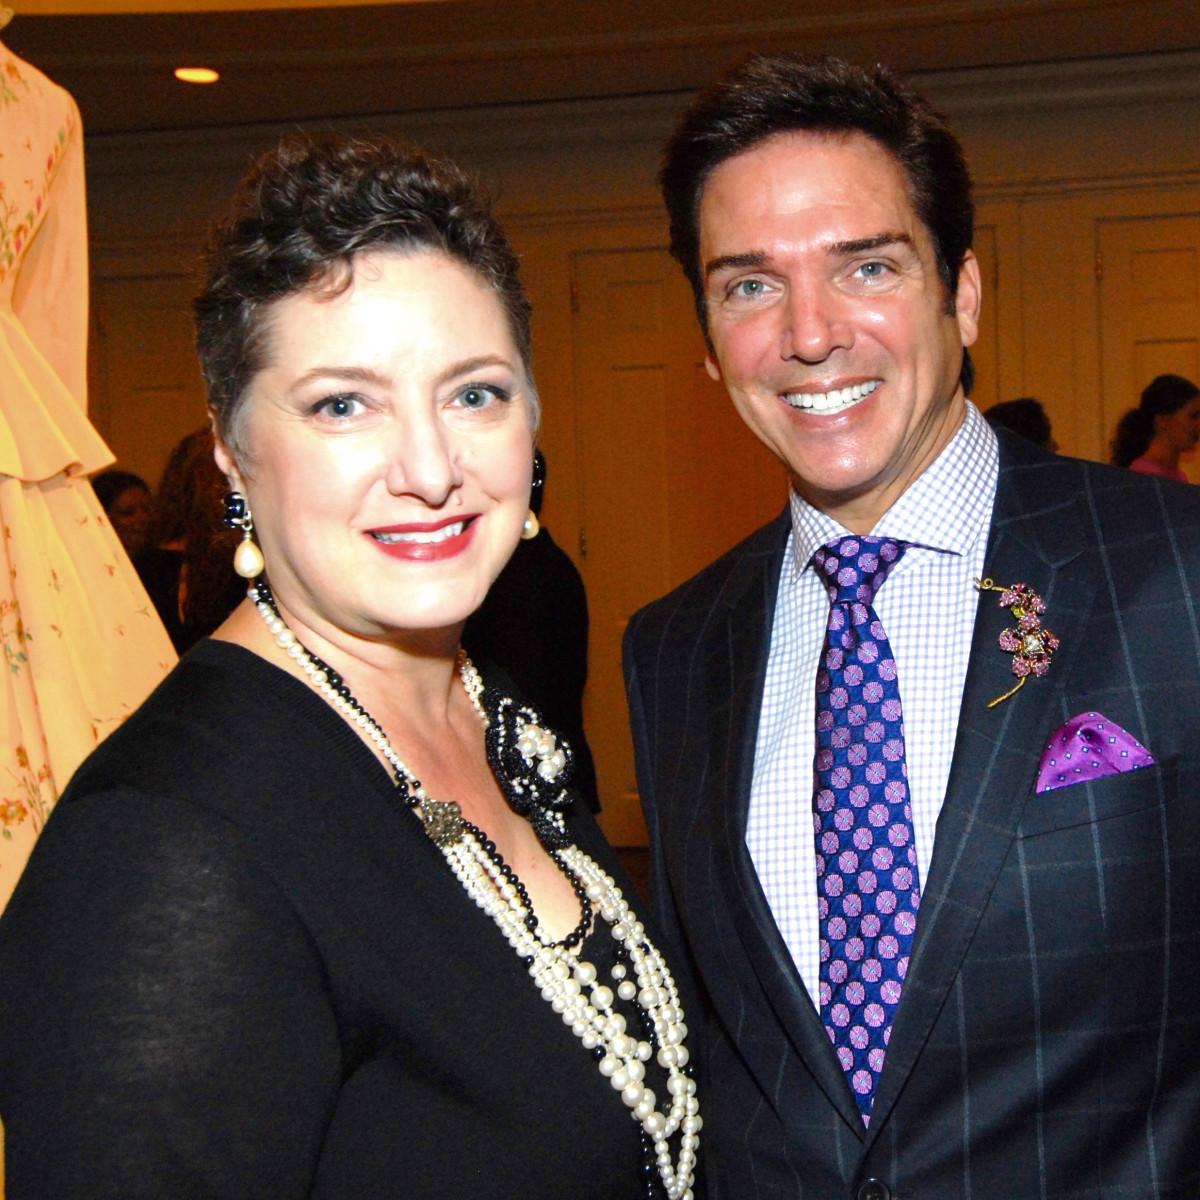 Tamara Klosz Bonar and Lenny Lenny Matuszewski at Salute to Retail Luncheon